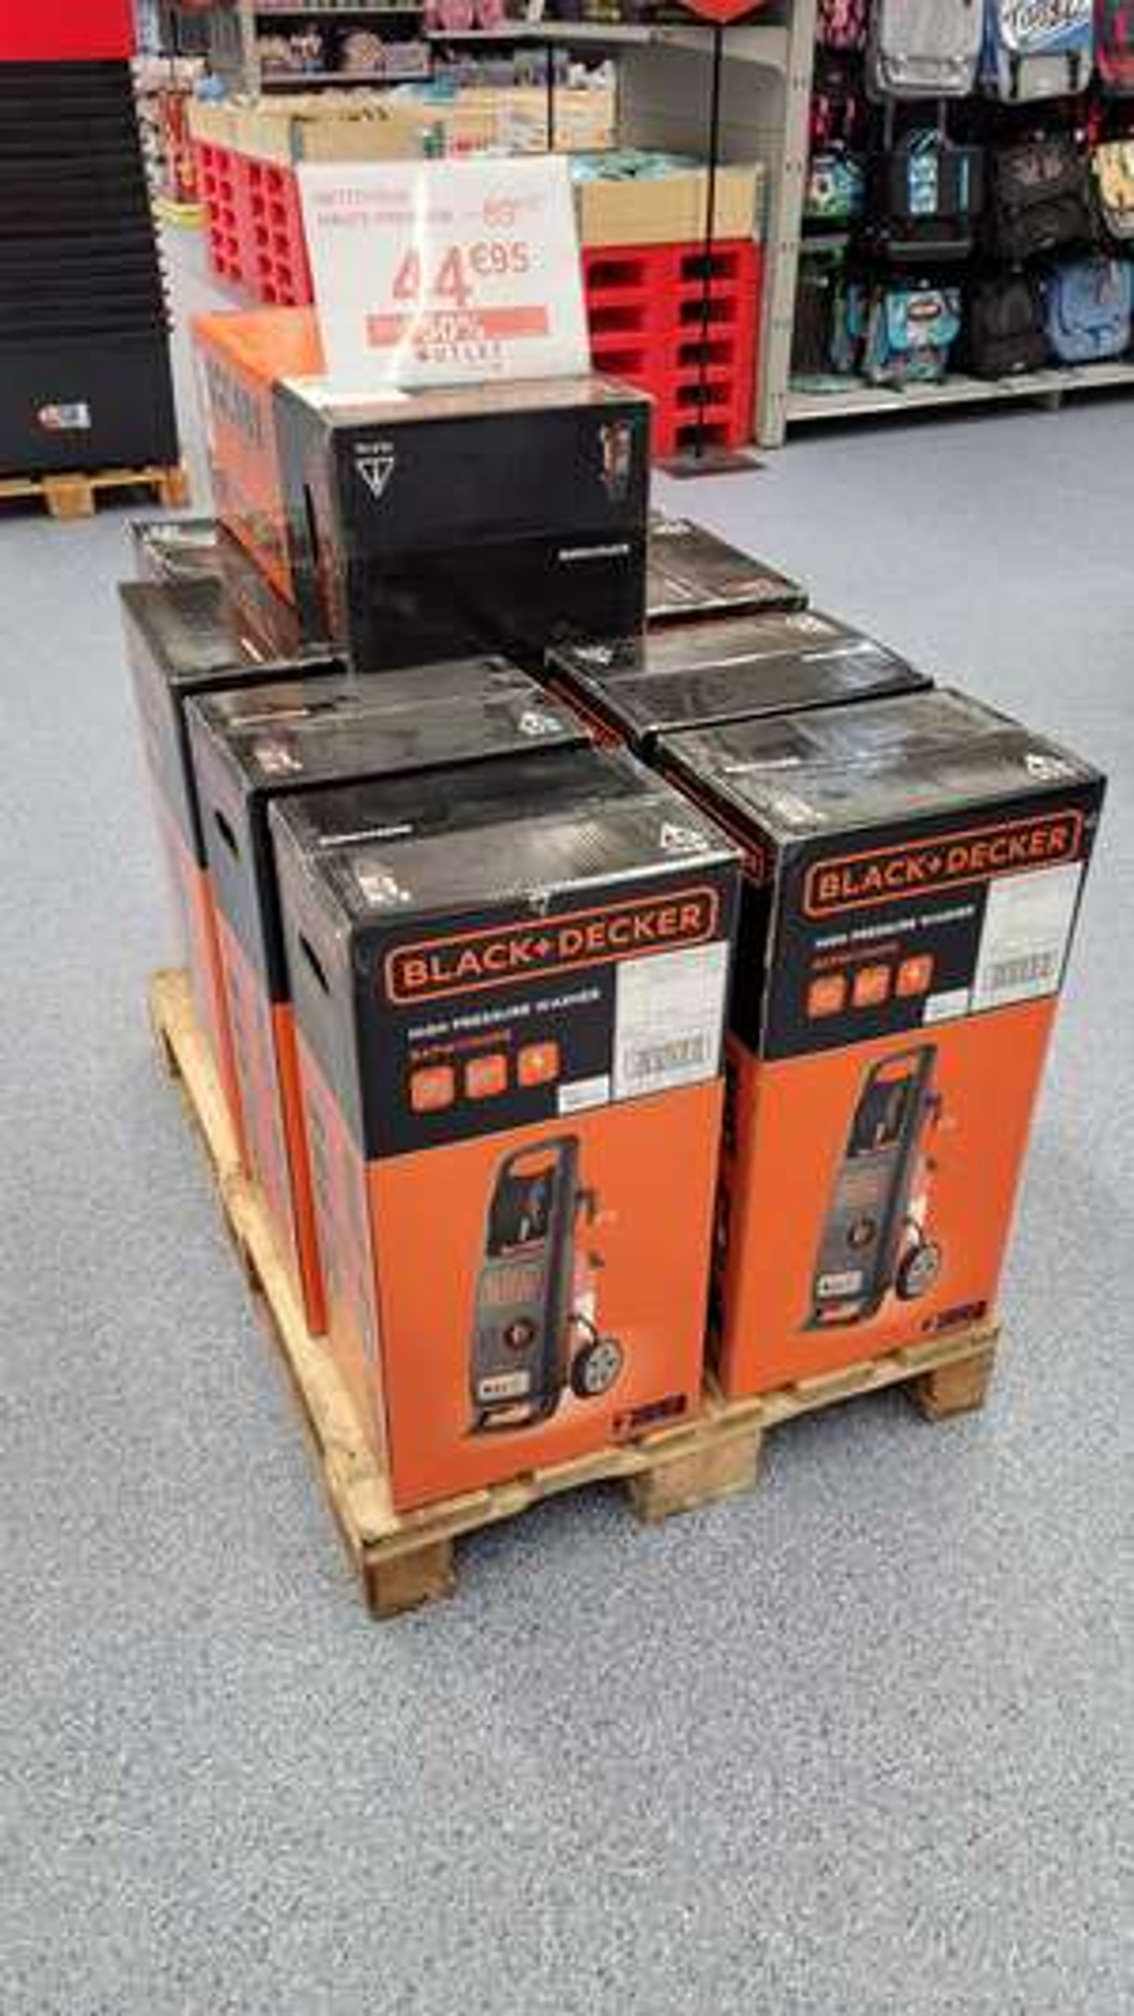 Nettoyeur haute-pression Black & Decker BXPW1700PE (130 bars, 1700 W) - Angers St Serge (49)